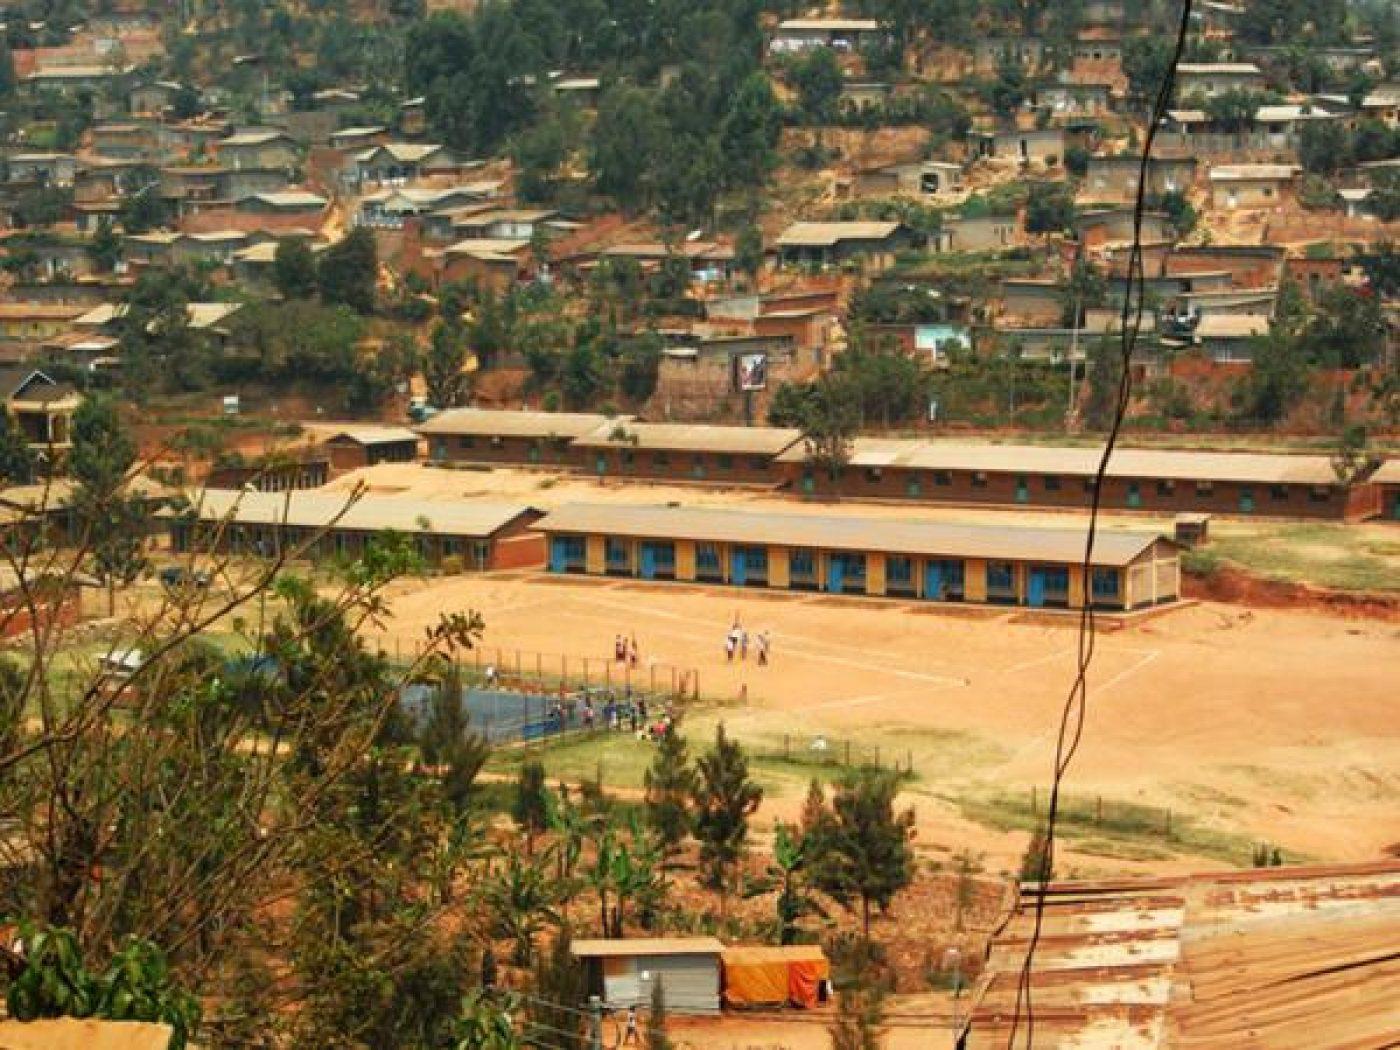 RWANDA: Kimisagara Football for Hope